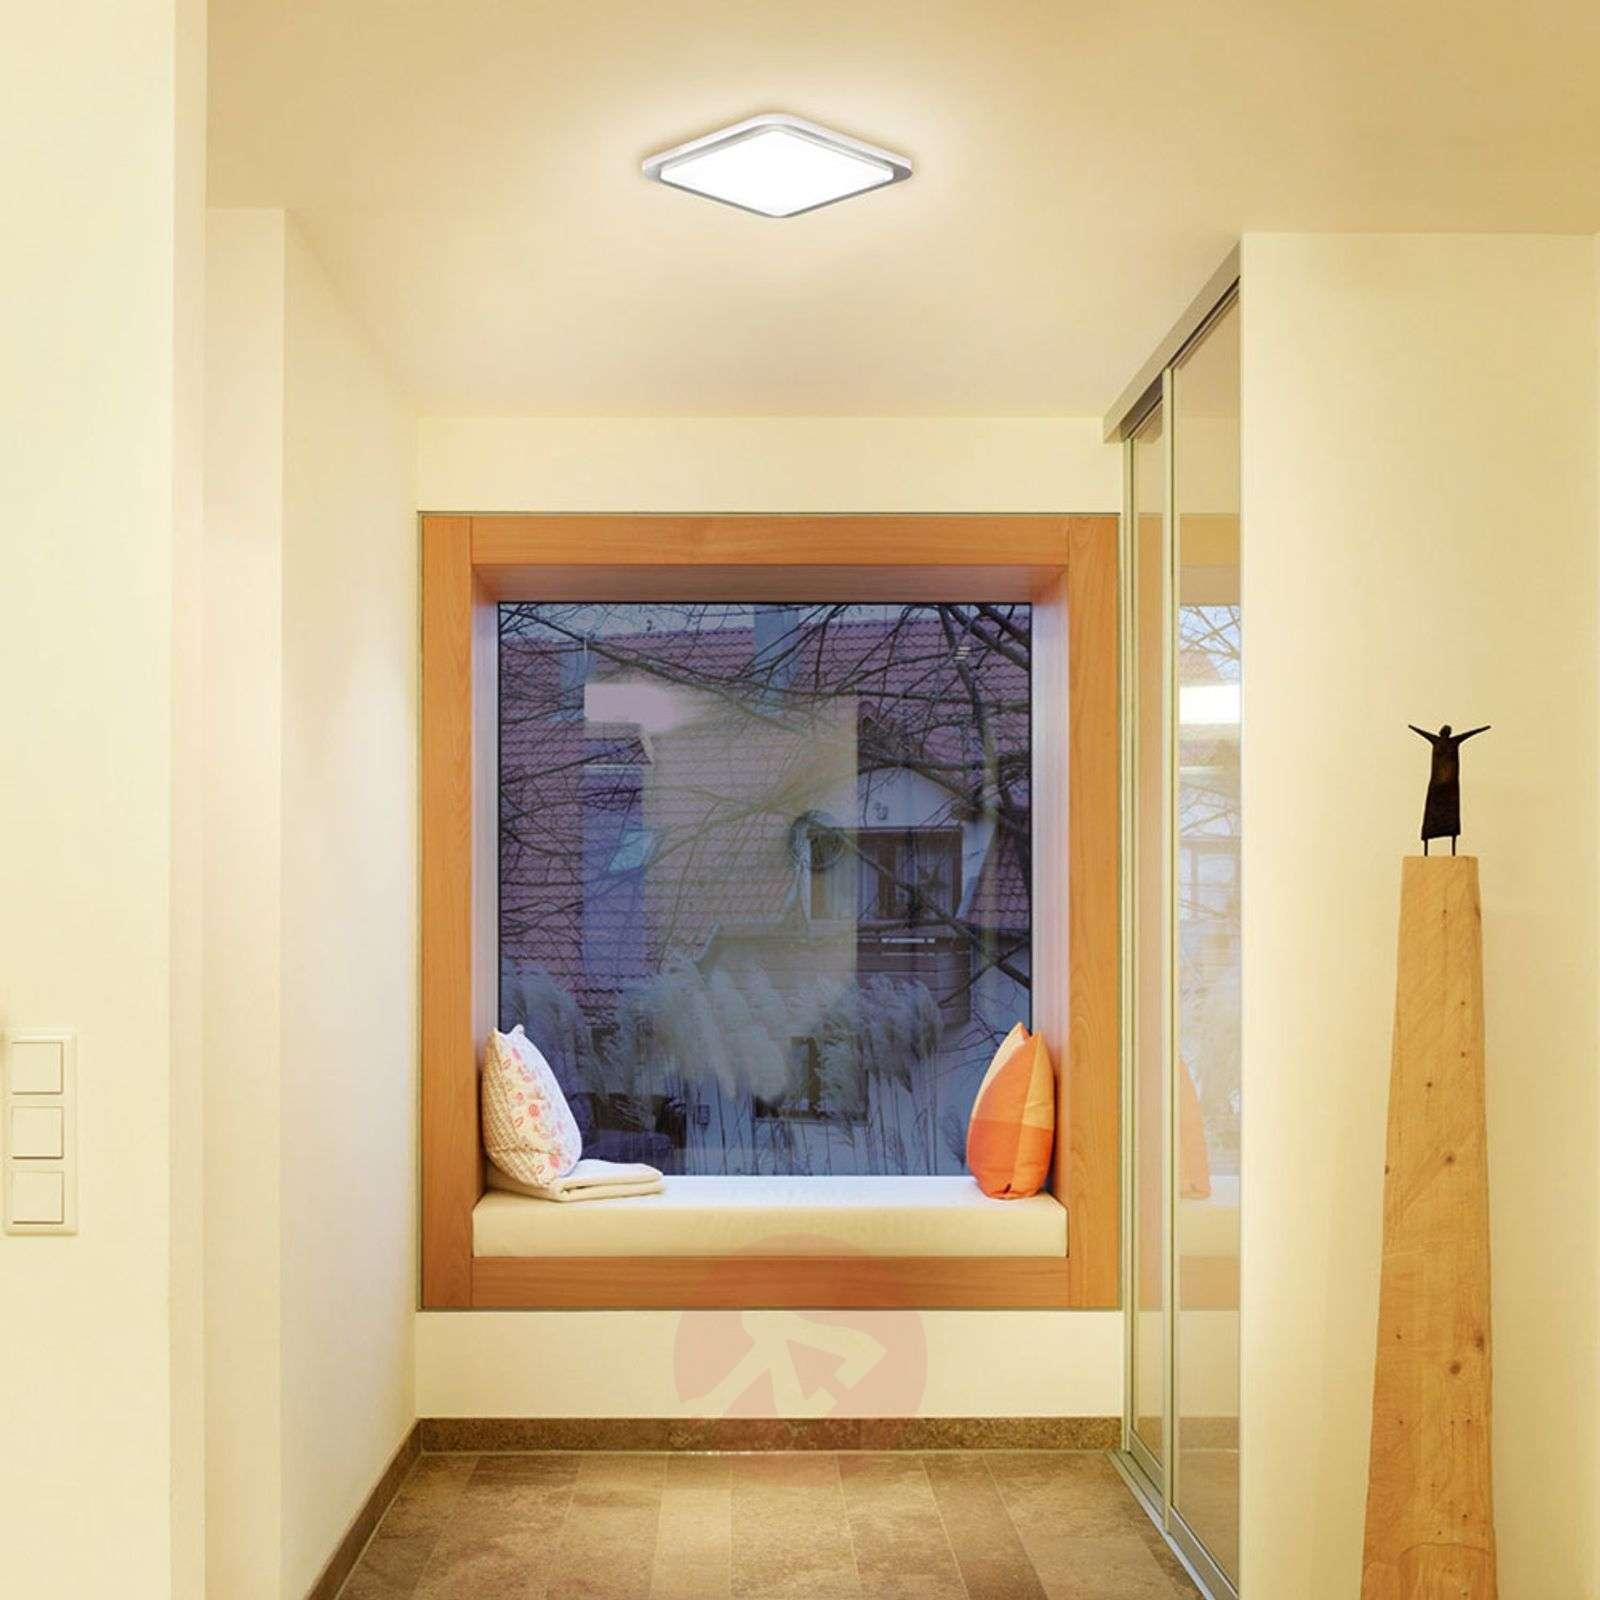 STEINEL Smart Friends LED ceiling light RS LED D2-8505723-01